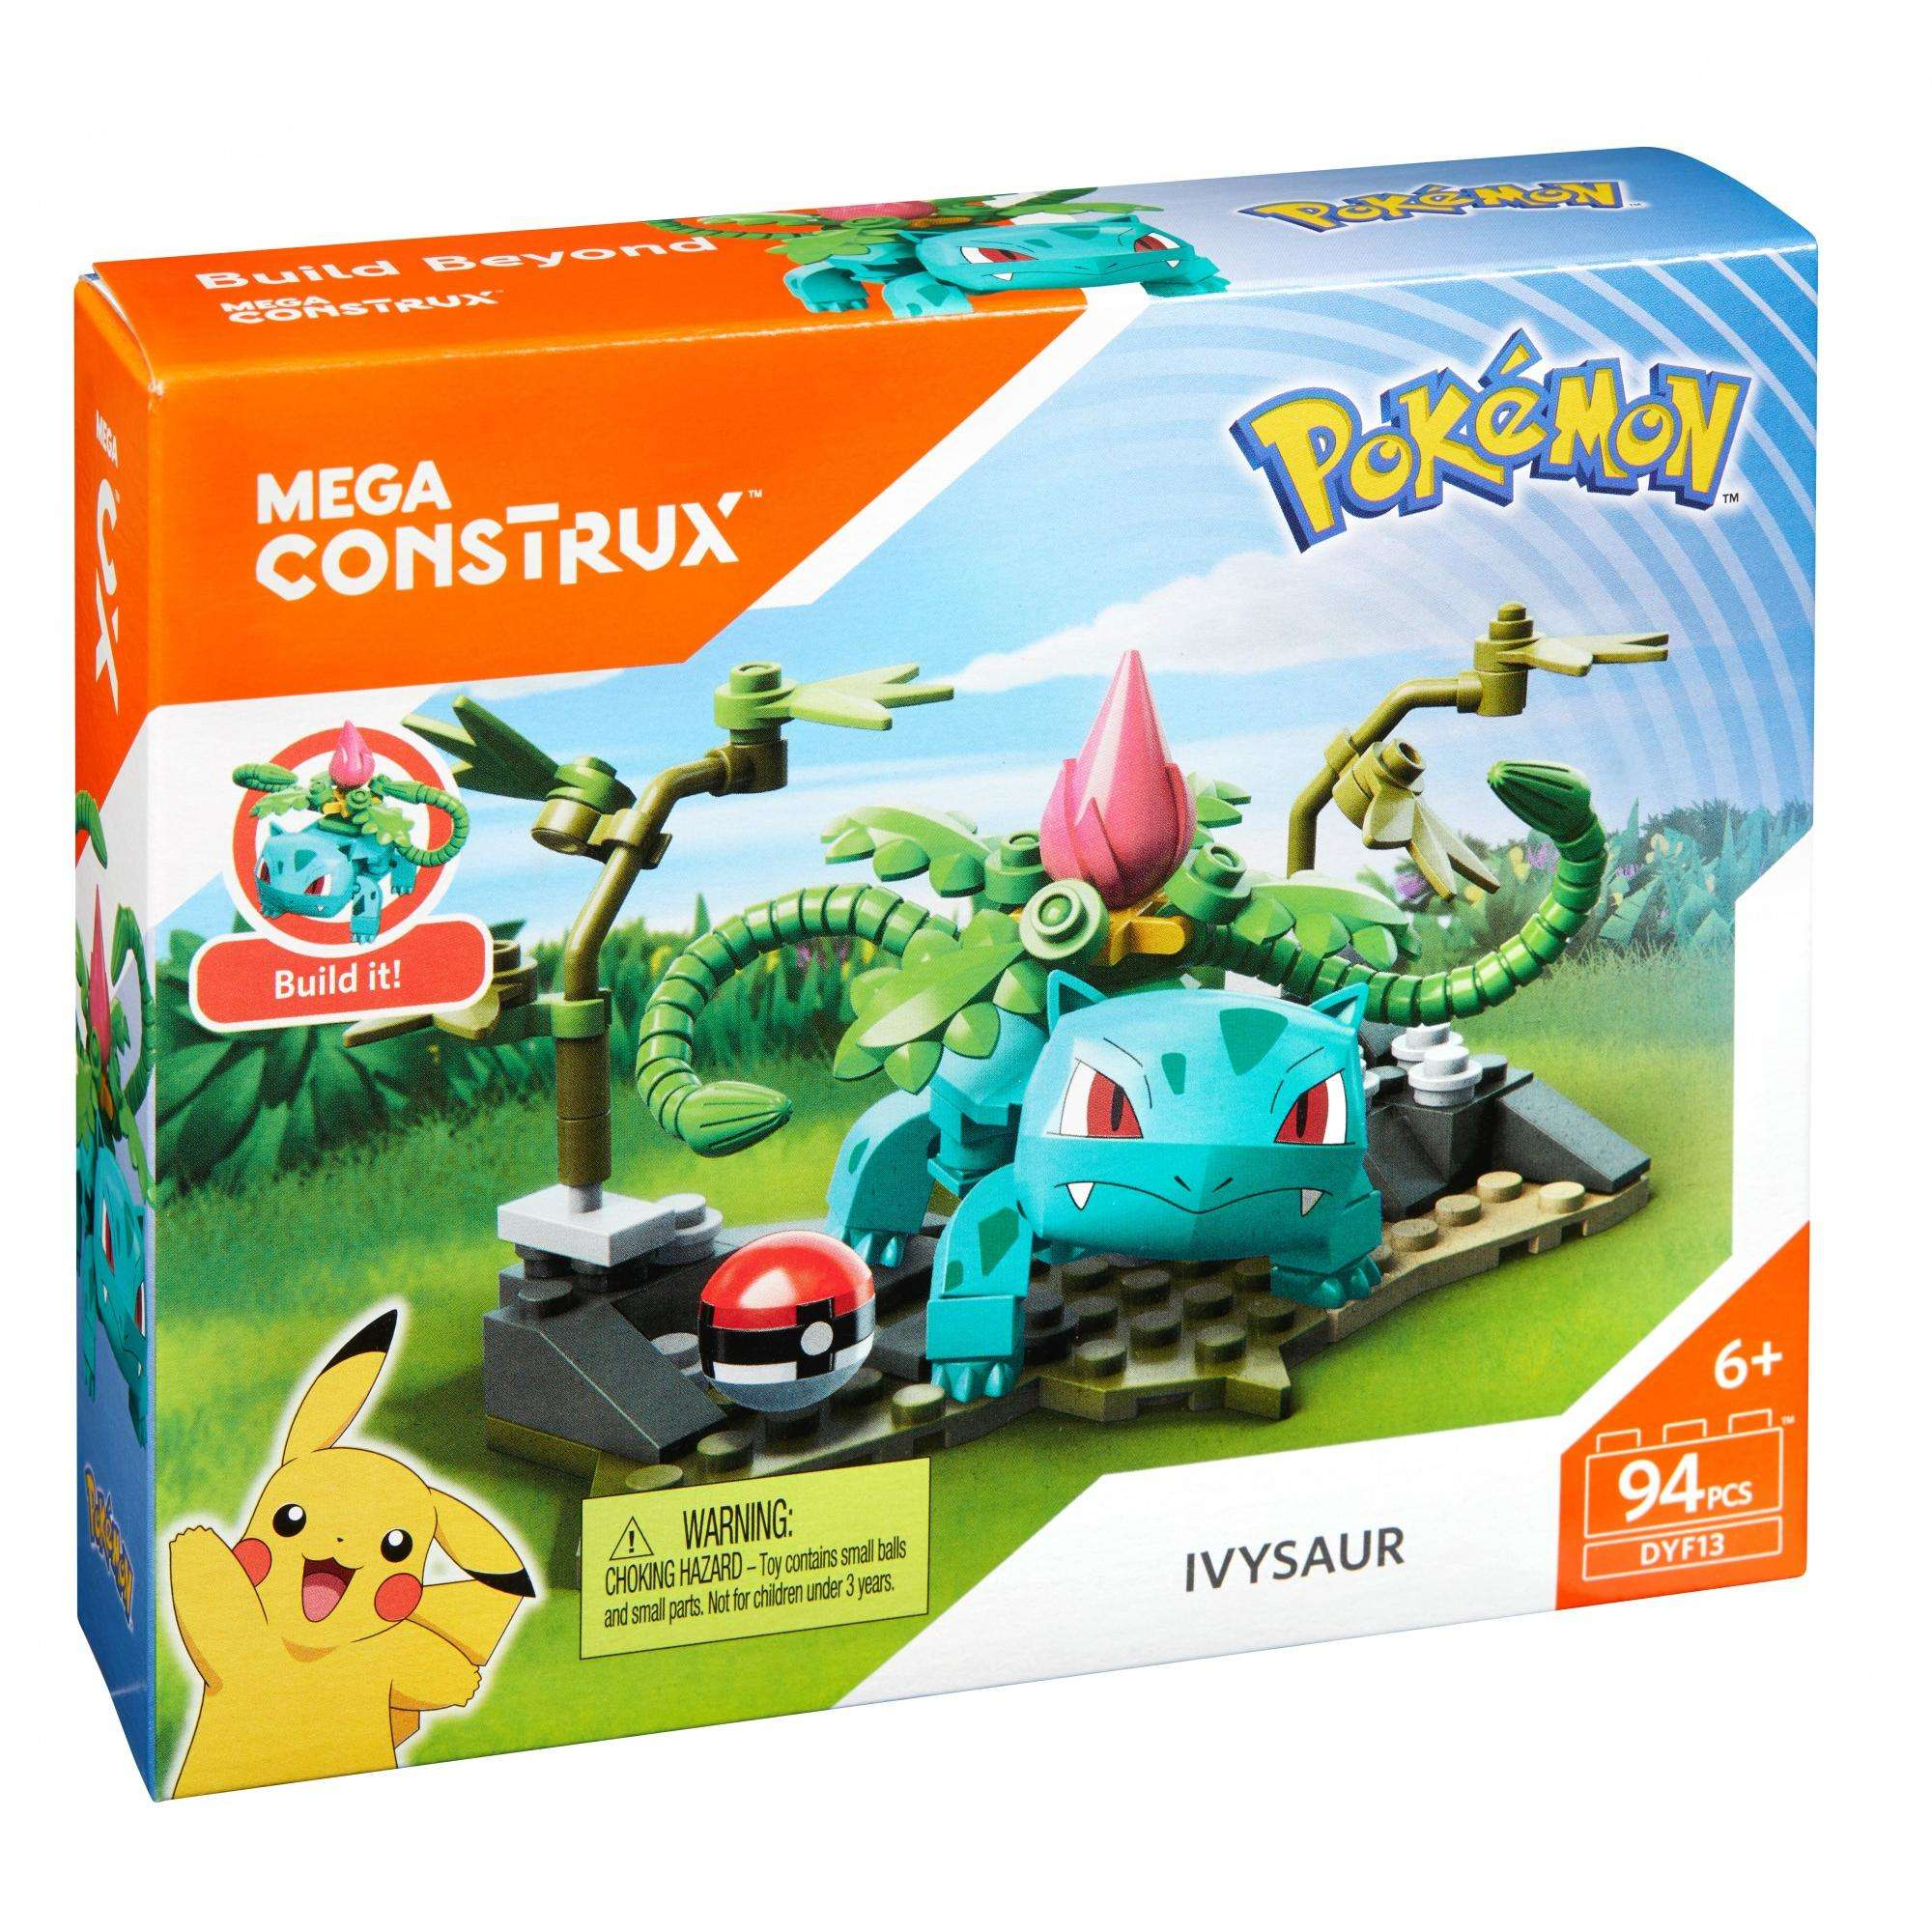 Pokemon Ivysaur Building Set Mega Construx